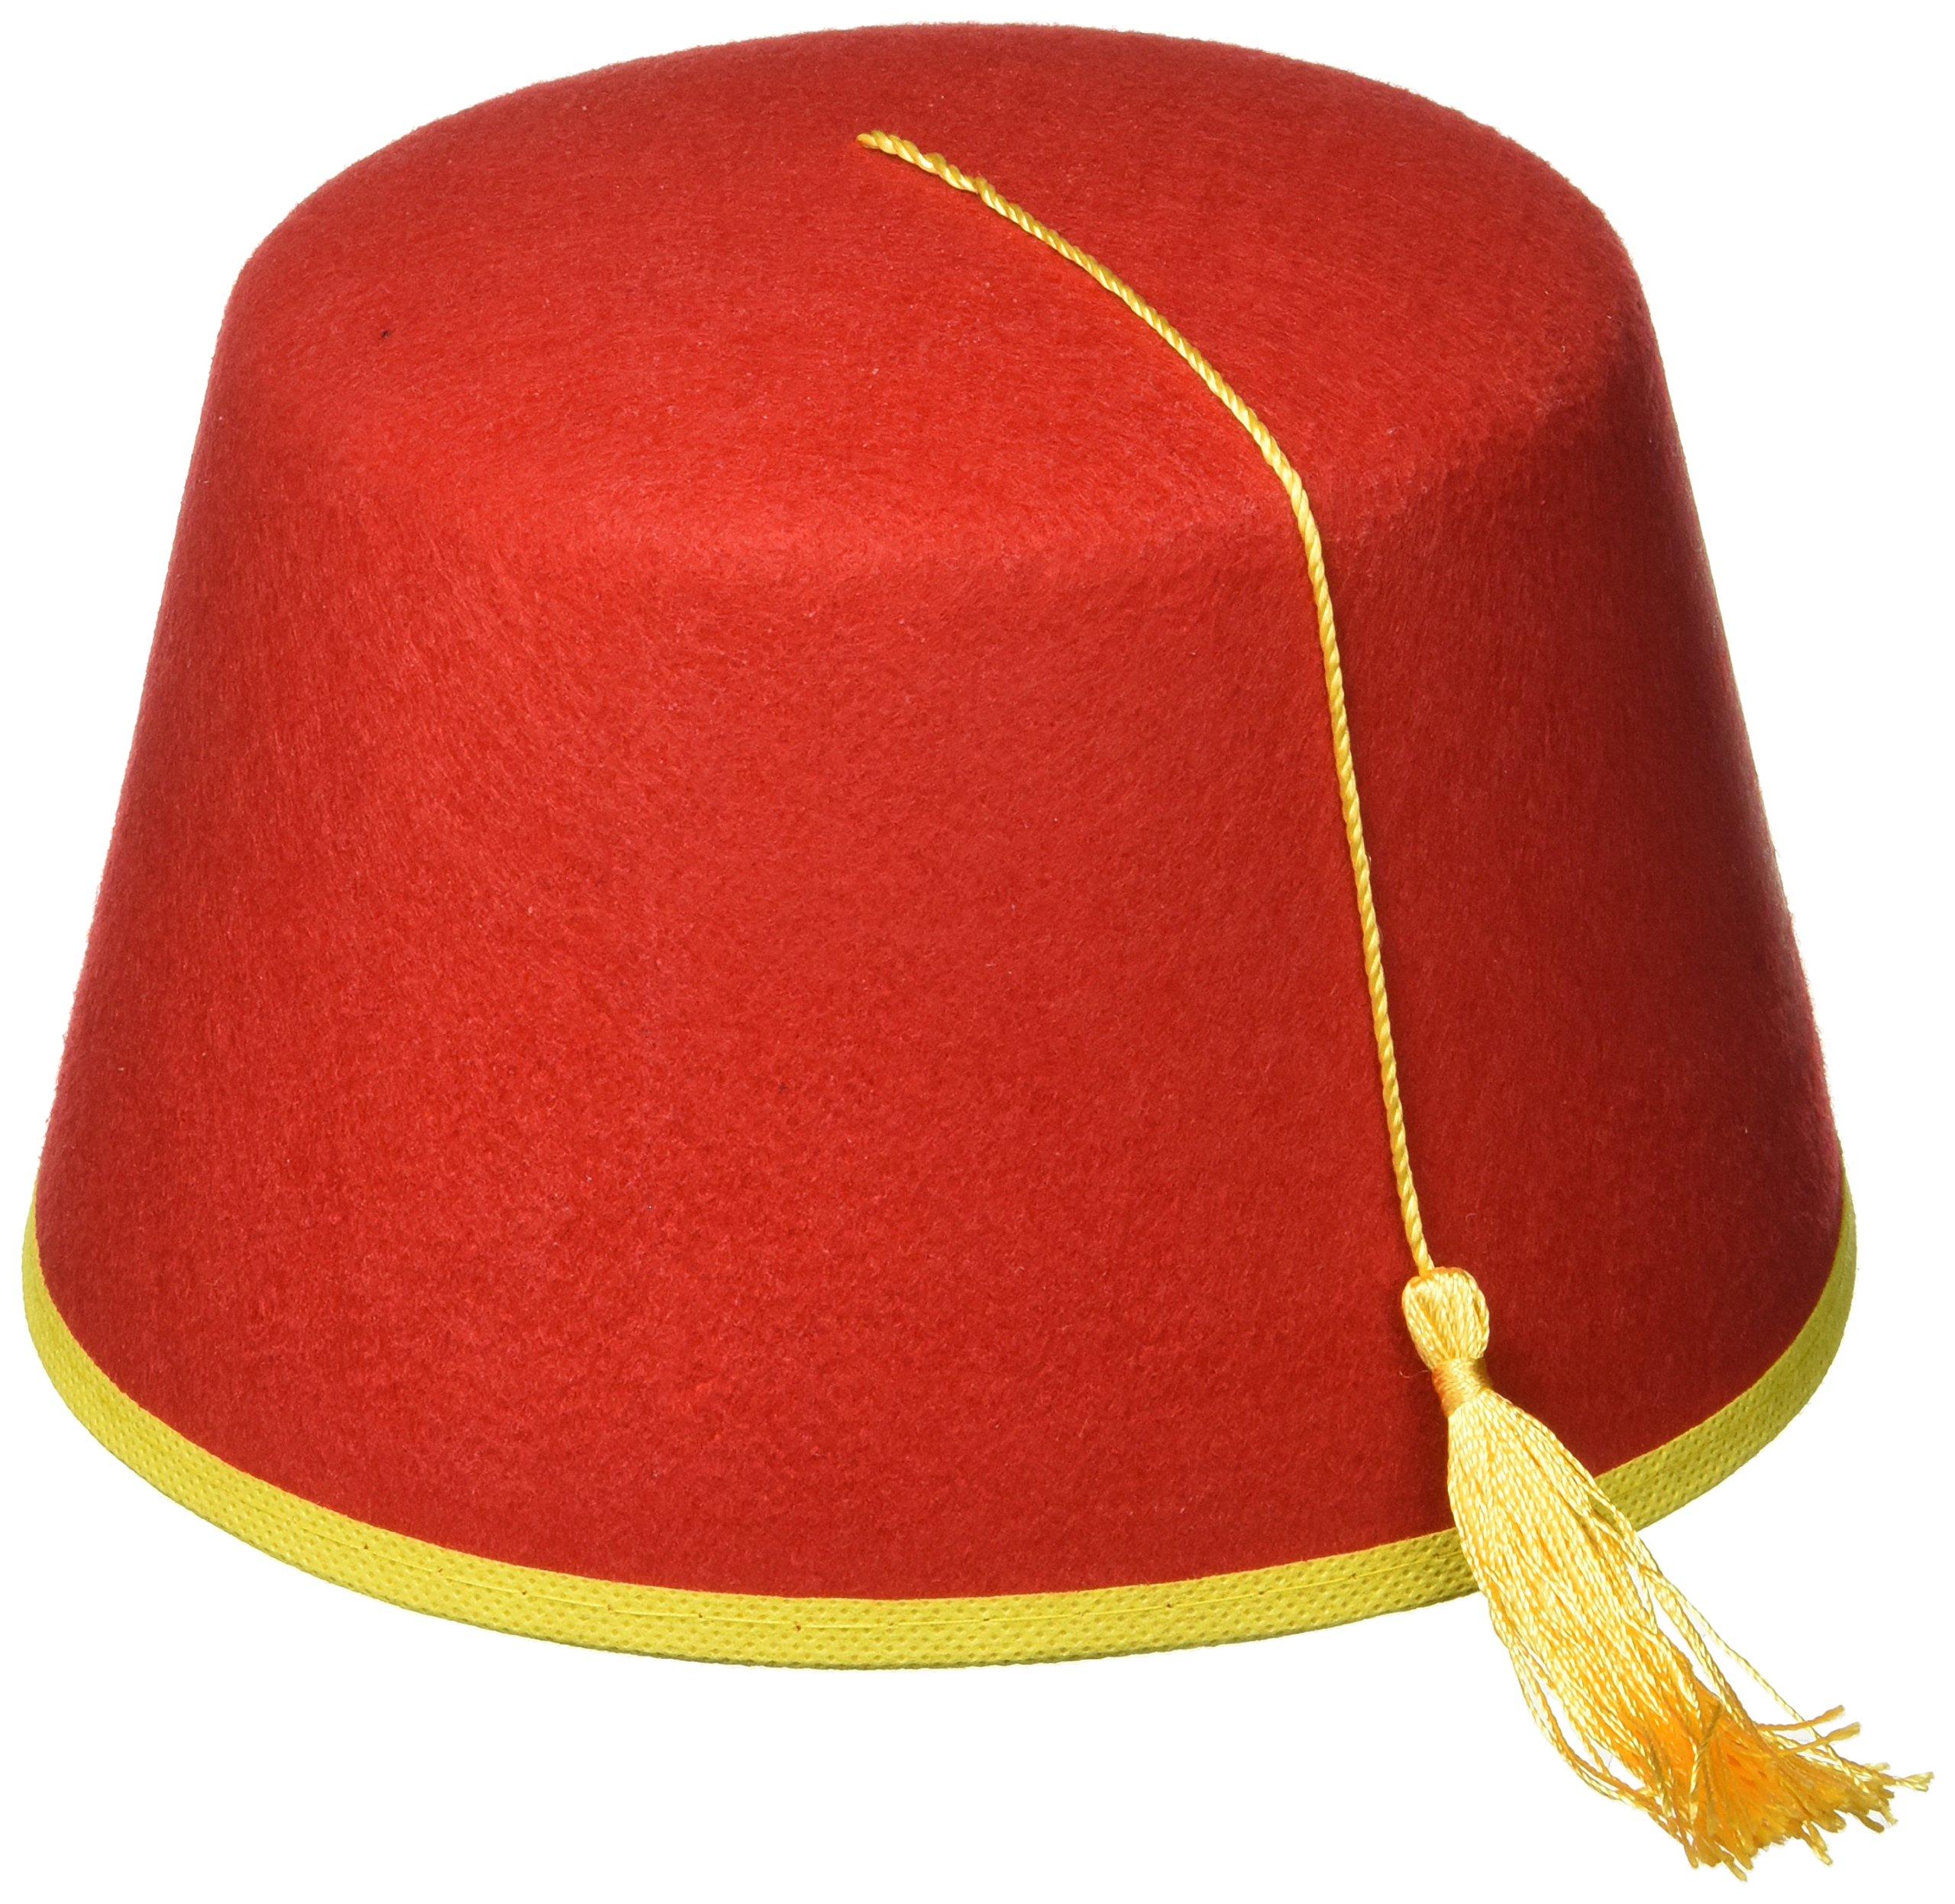 Get Quotations · Forum Novelties Red Fez Felt Hat 1dea7669ad78